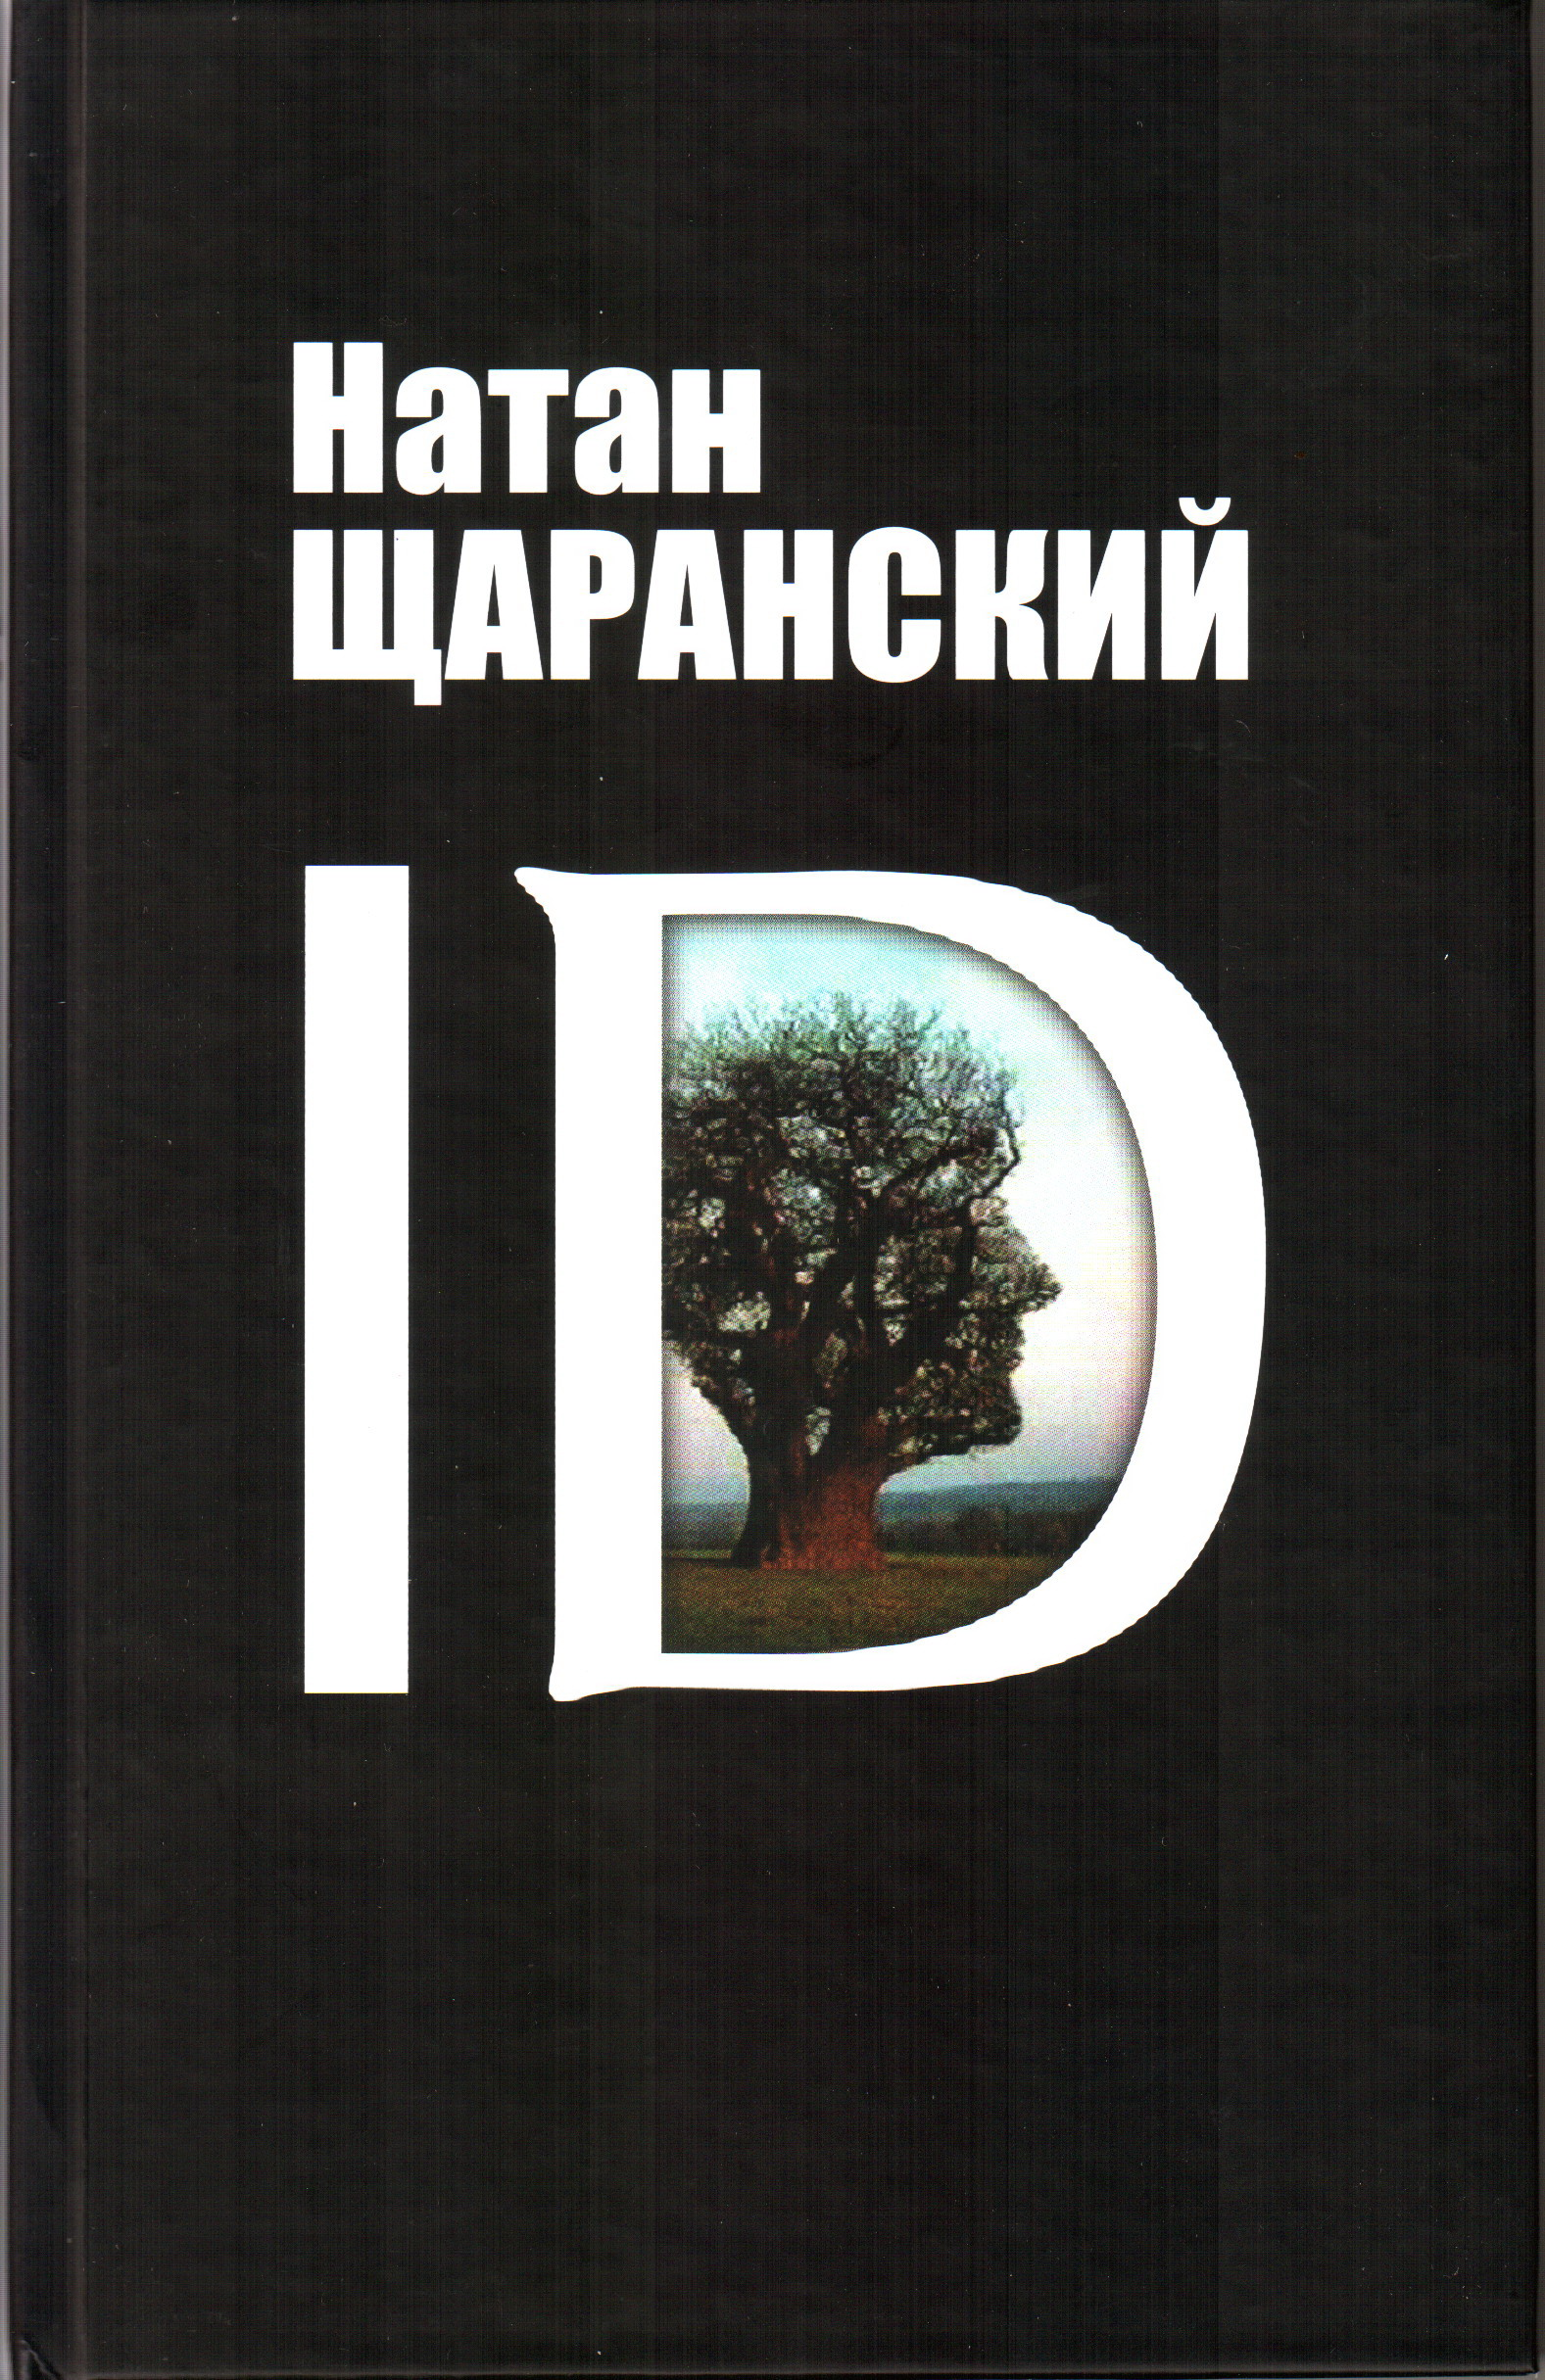 ID. Identityи ее решающая роль в защите демократии